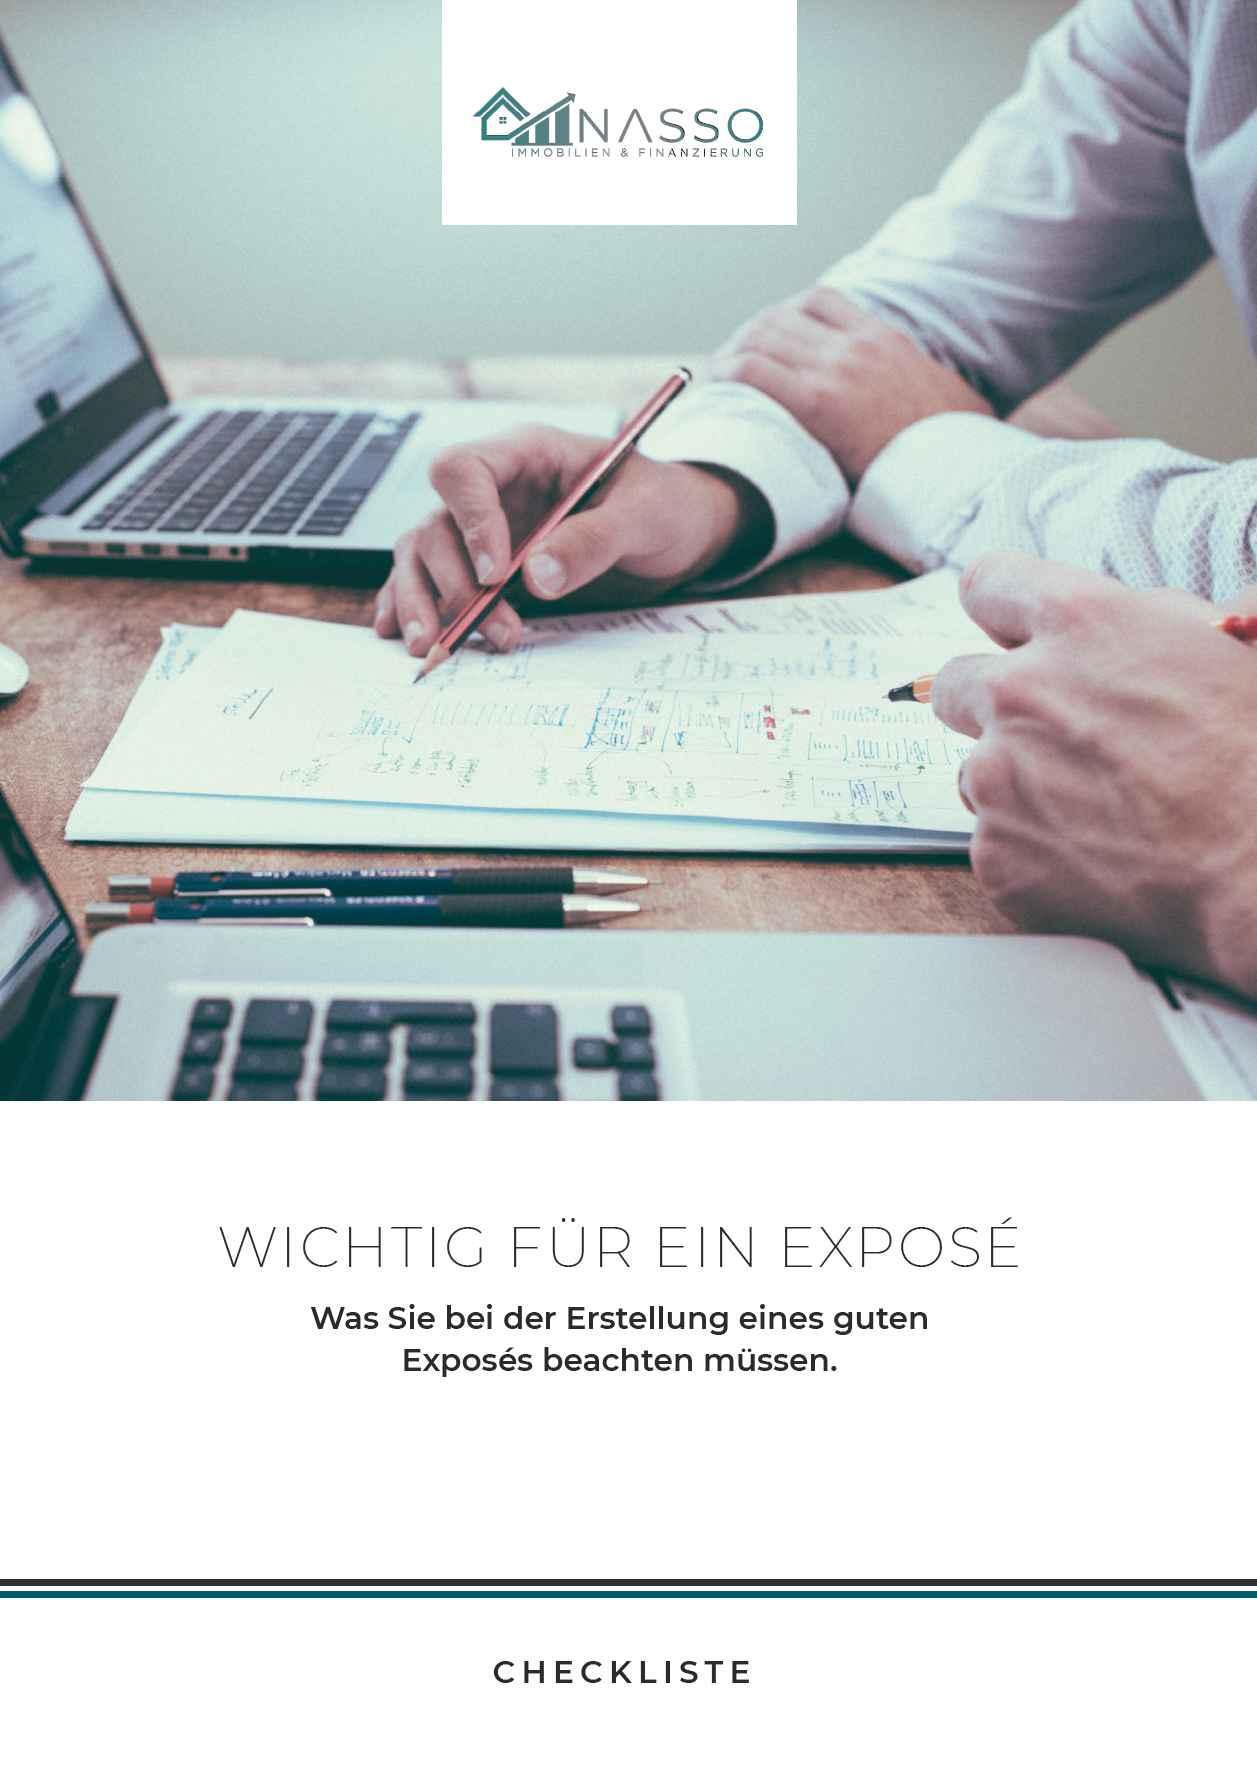 immonasso-ratgeber-cover-wichtig-fuer-expose